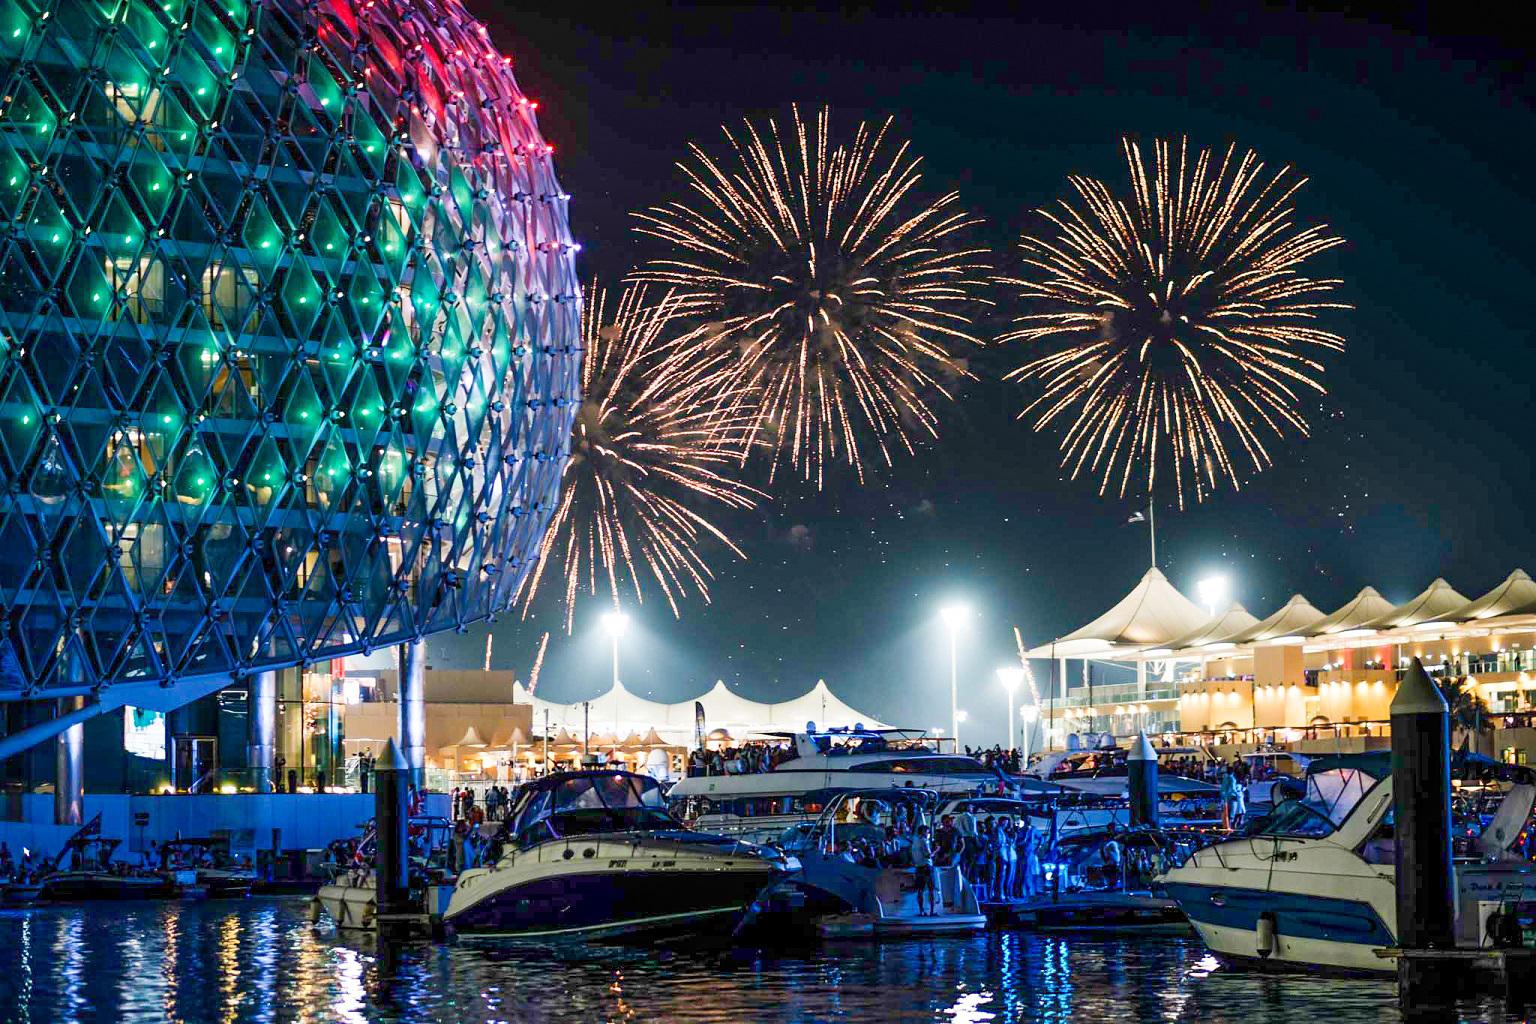 UAE a leading international tourism destination - News - Emirates -  Emirates24